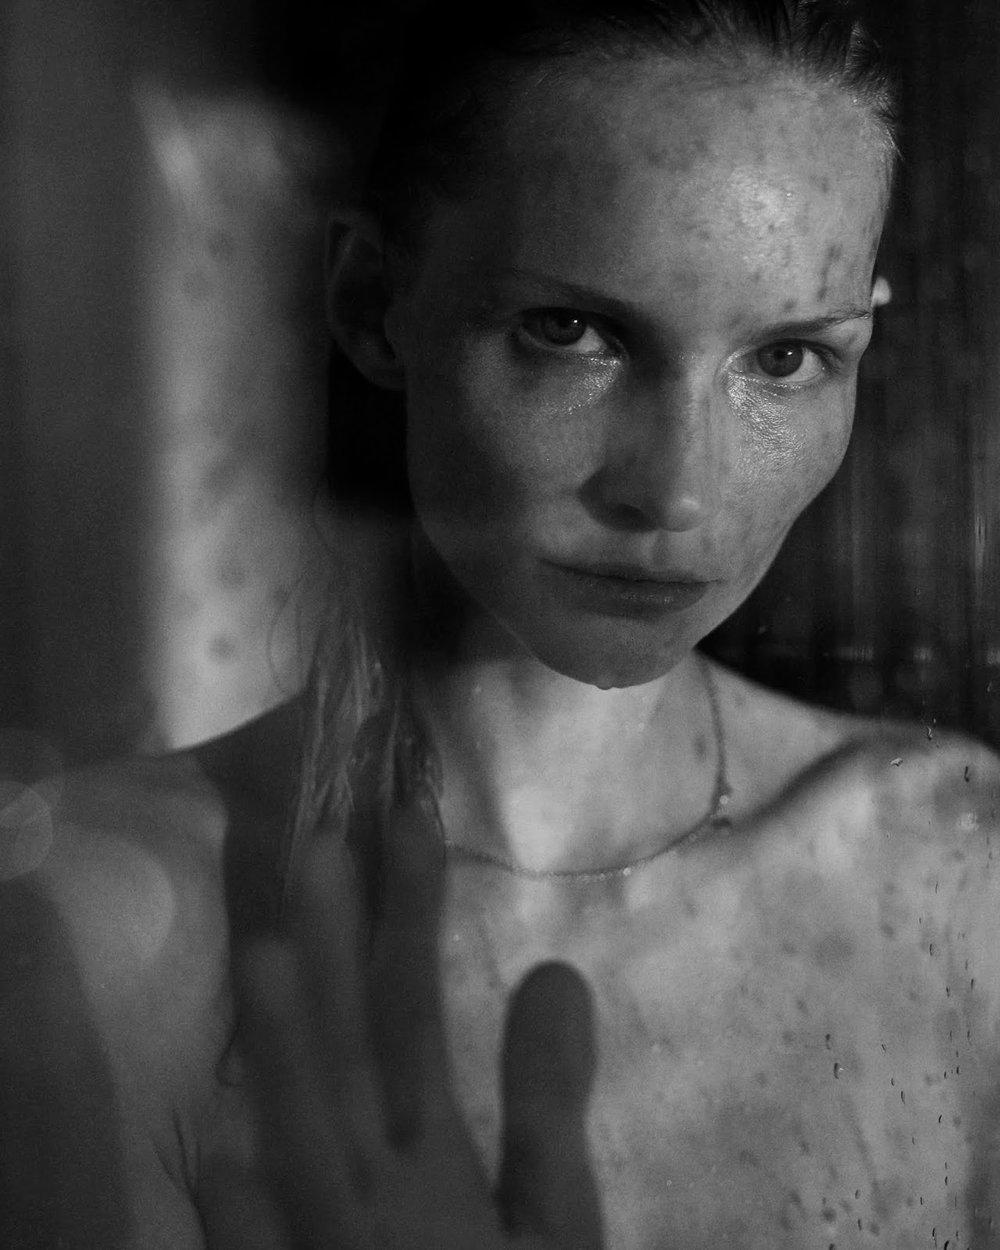 Katrin Thormann by Tobias Lundkvist for ELLE Germany (8).jpg